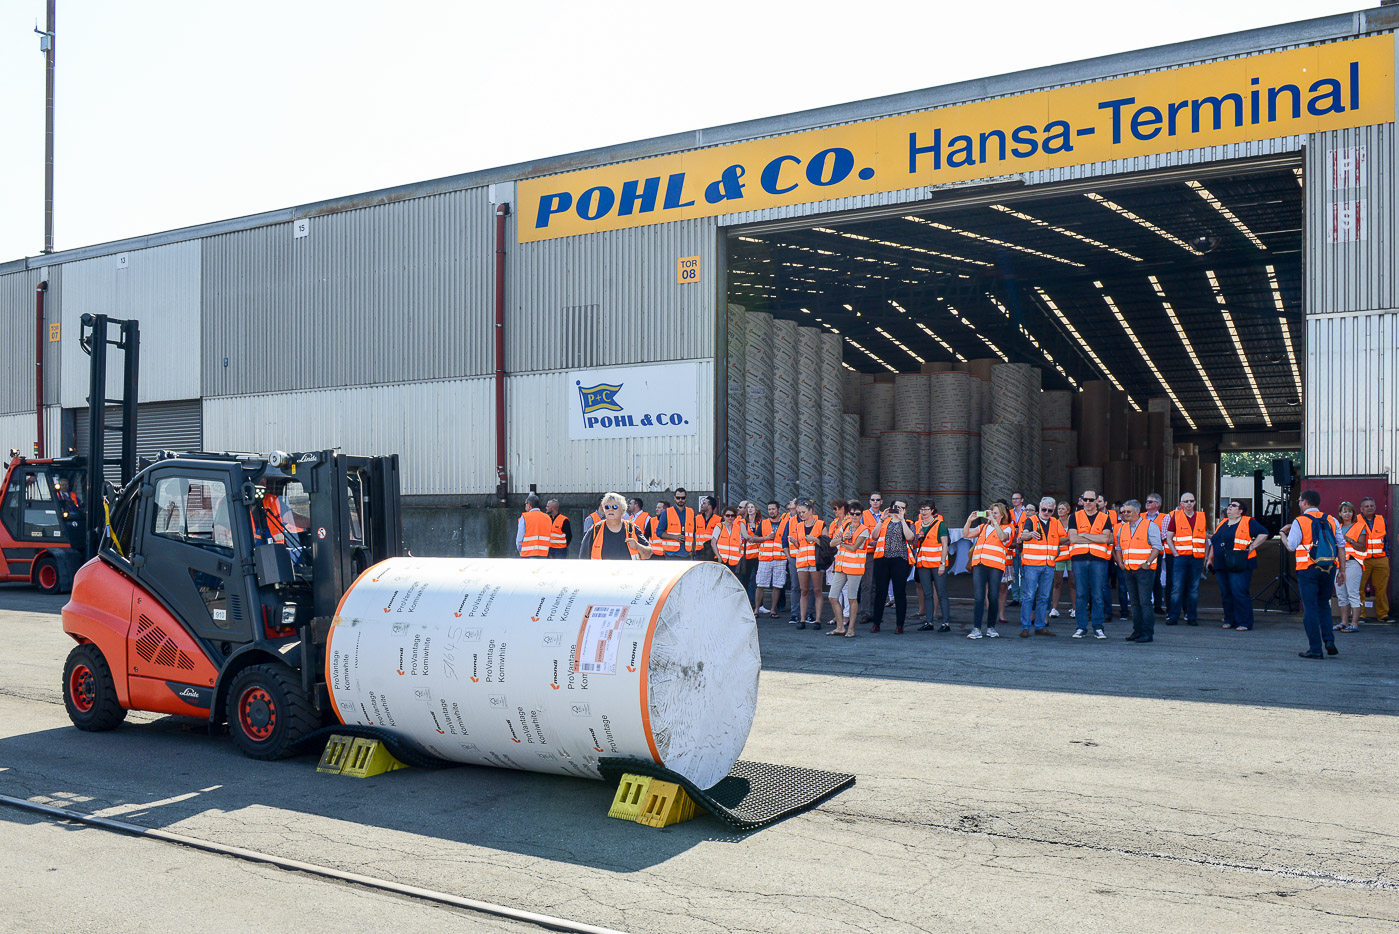 Foto ID 16060313 Pohl + Co Hansa Terminal